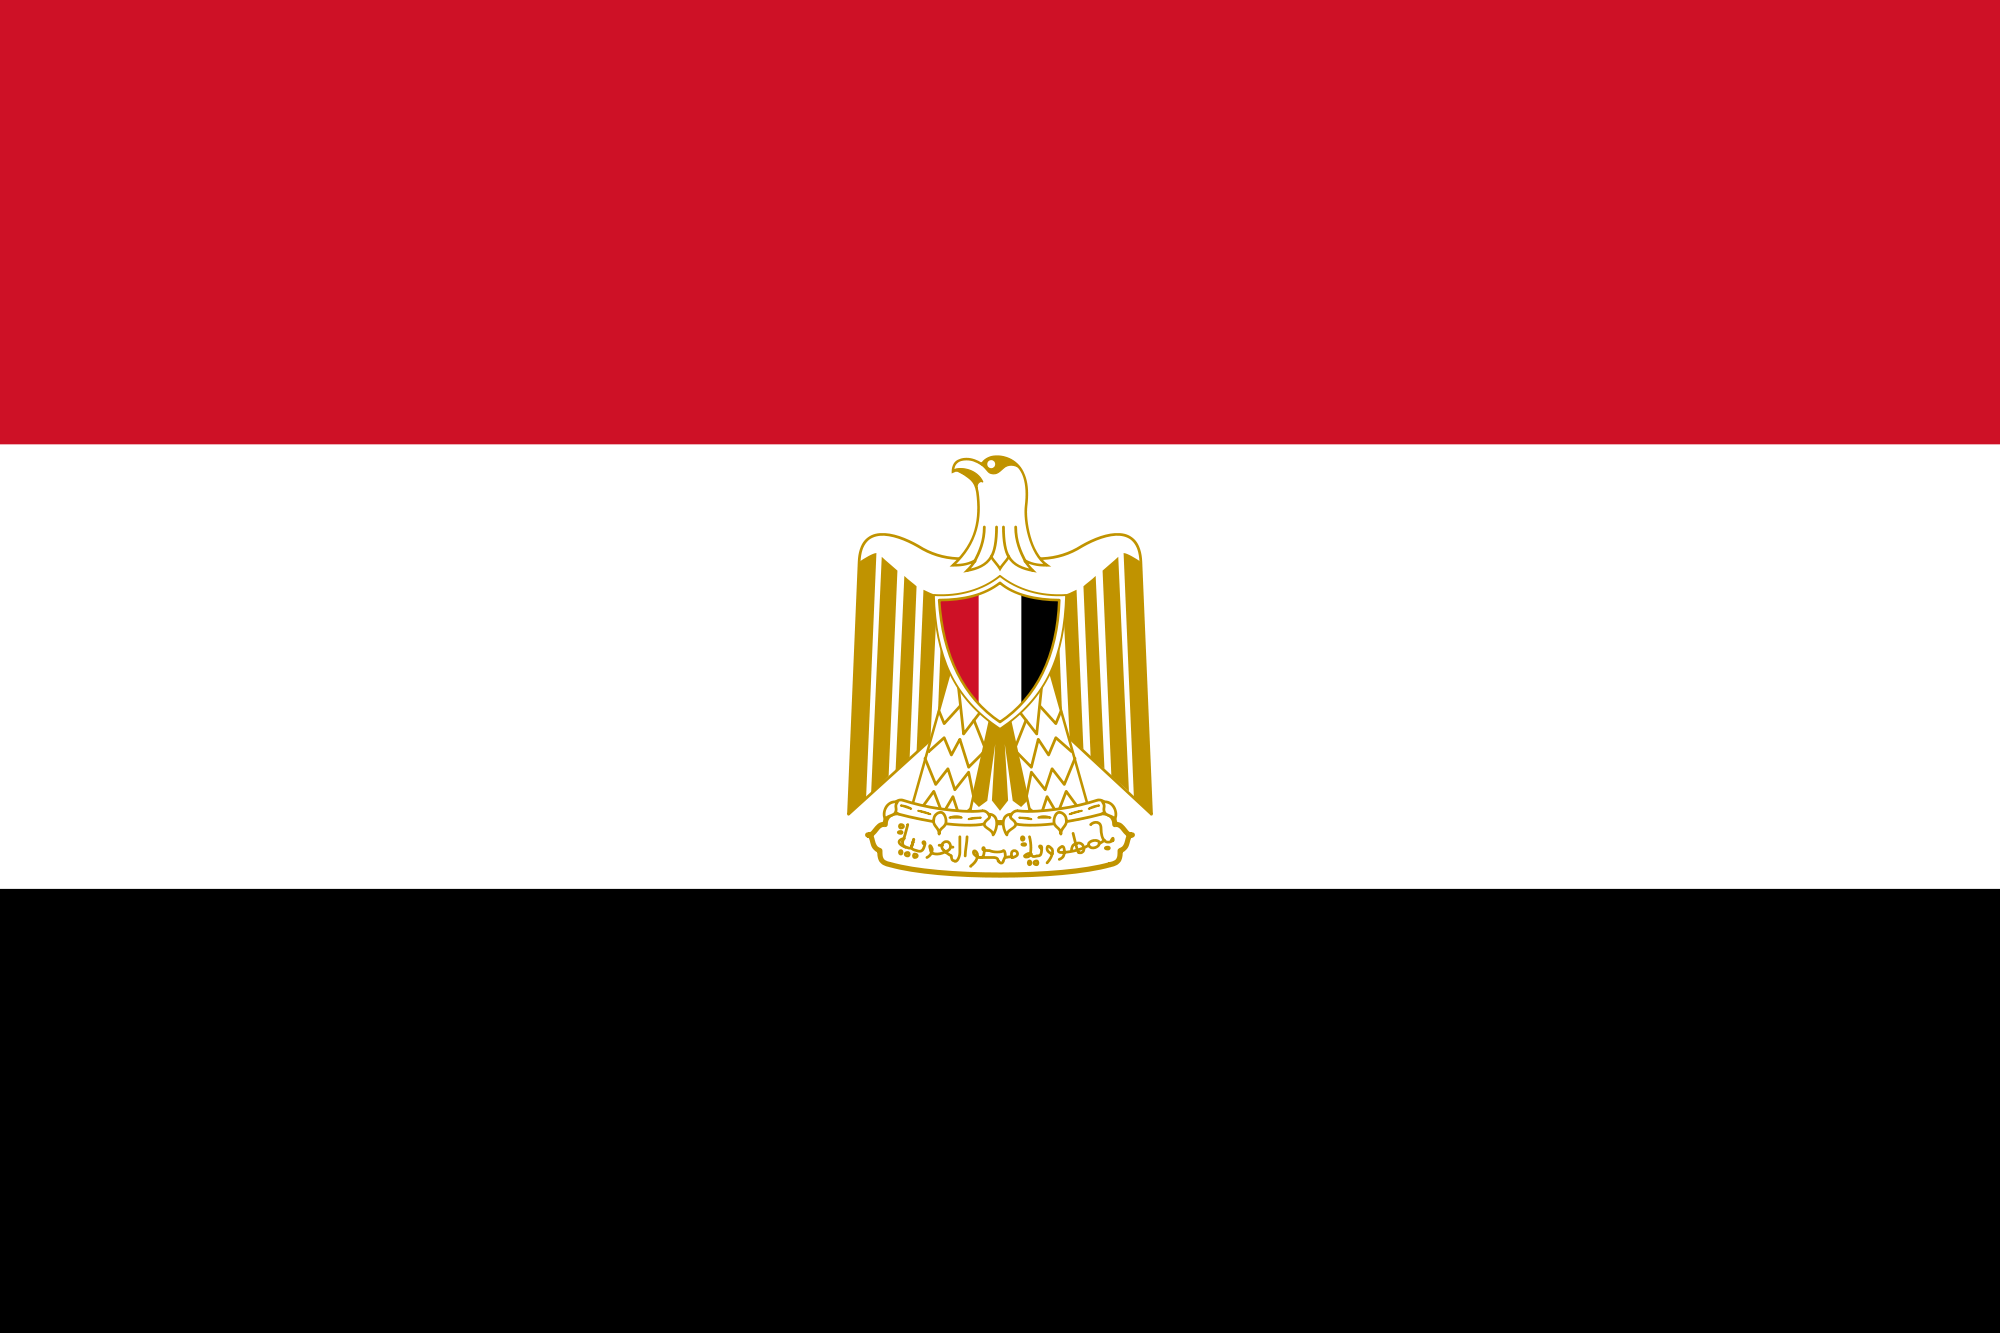 Flagge Ägypten | Ägypten / EGYPT | Pinterest | Flagge